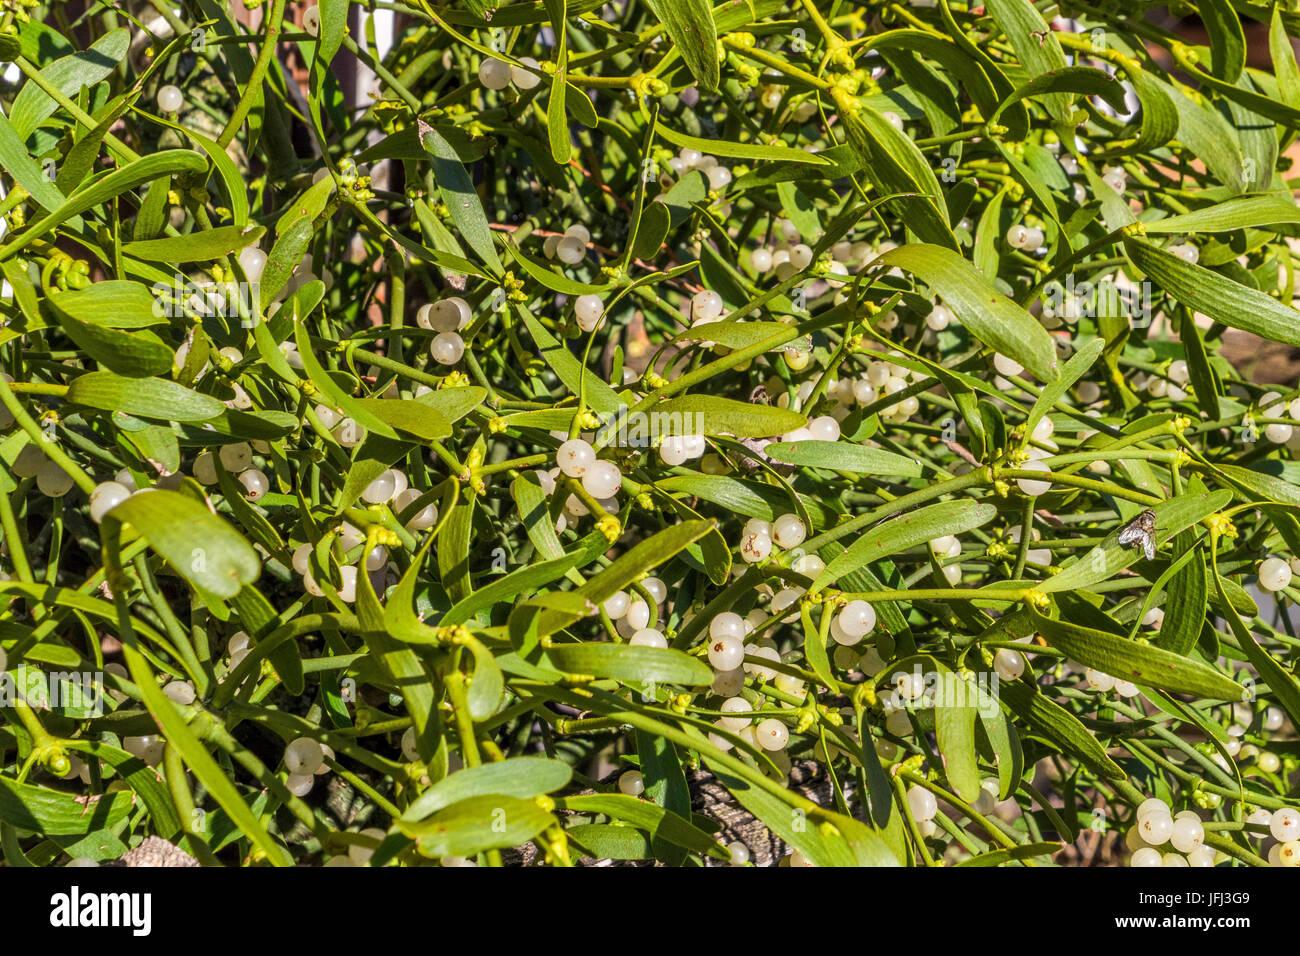 Mistletoes Sprig Of Mistletoe Stock Photo 147300729 Alamy